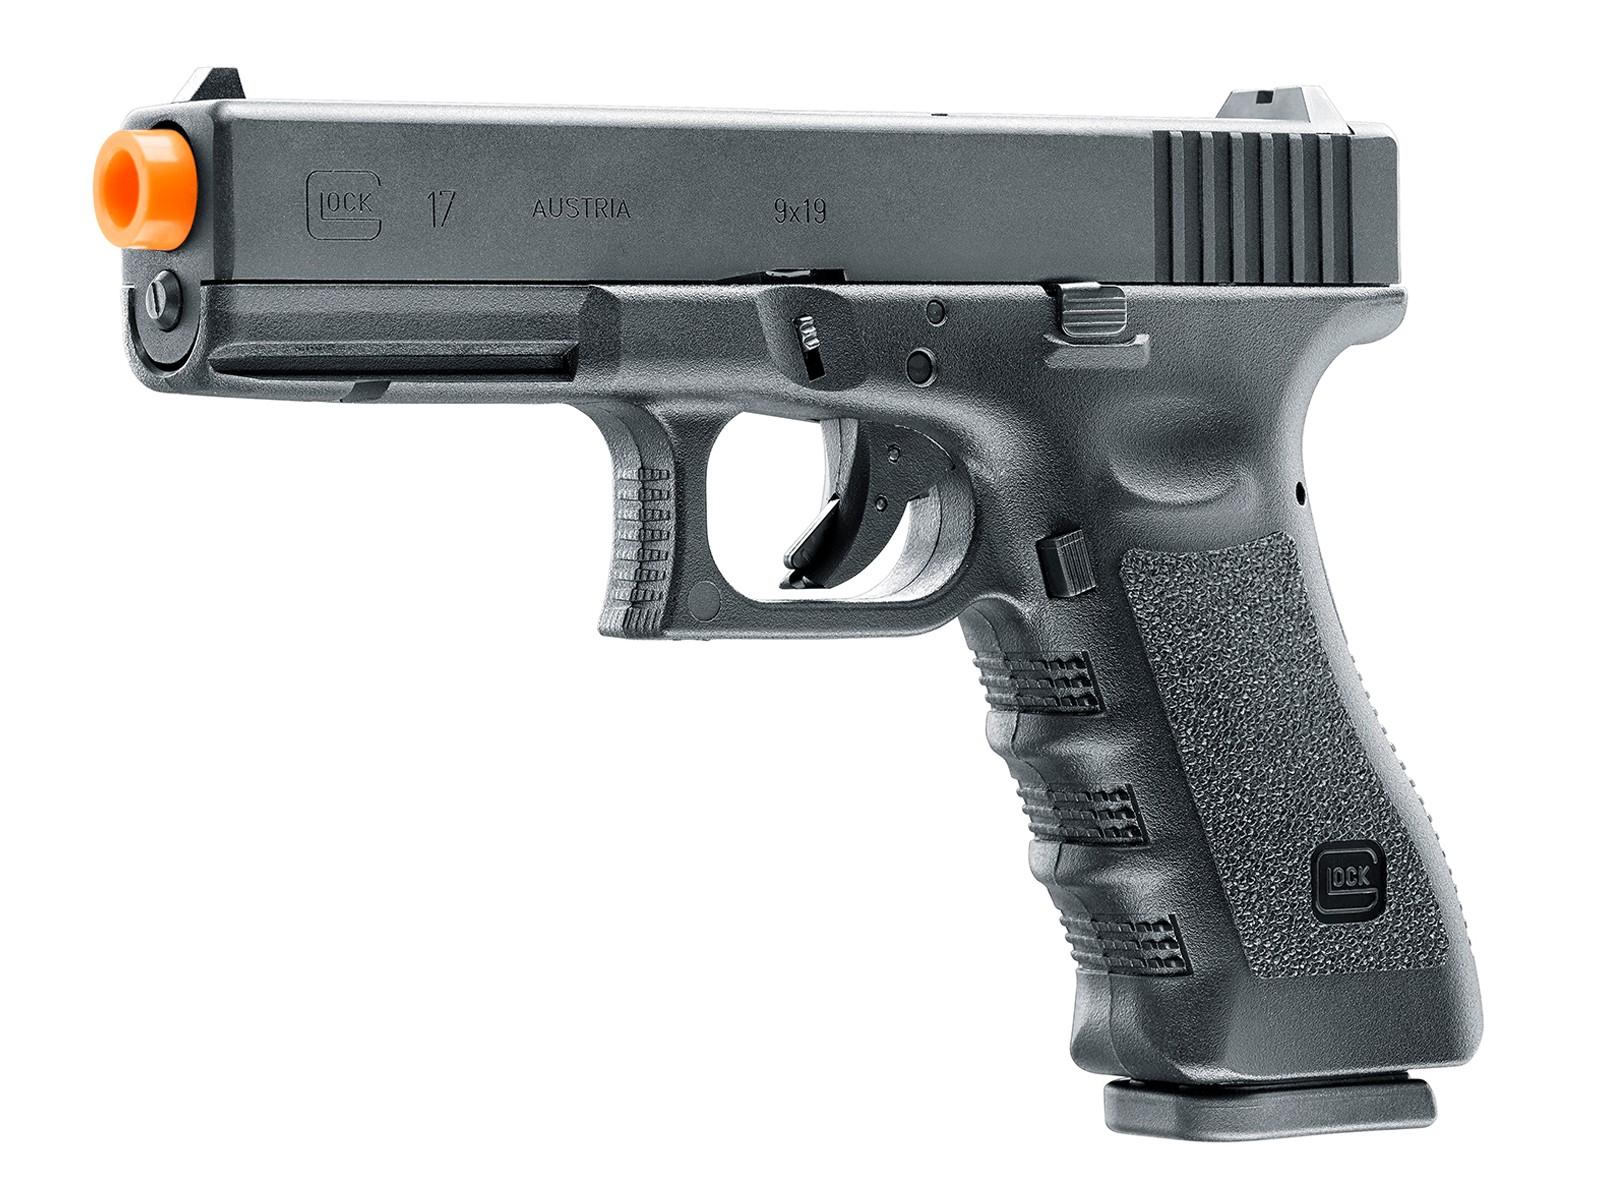 Glock_G17_Gen3_GBB_Airsoft_Pistol_6mm